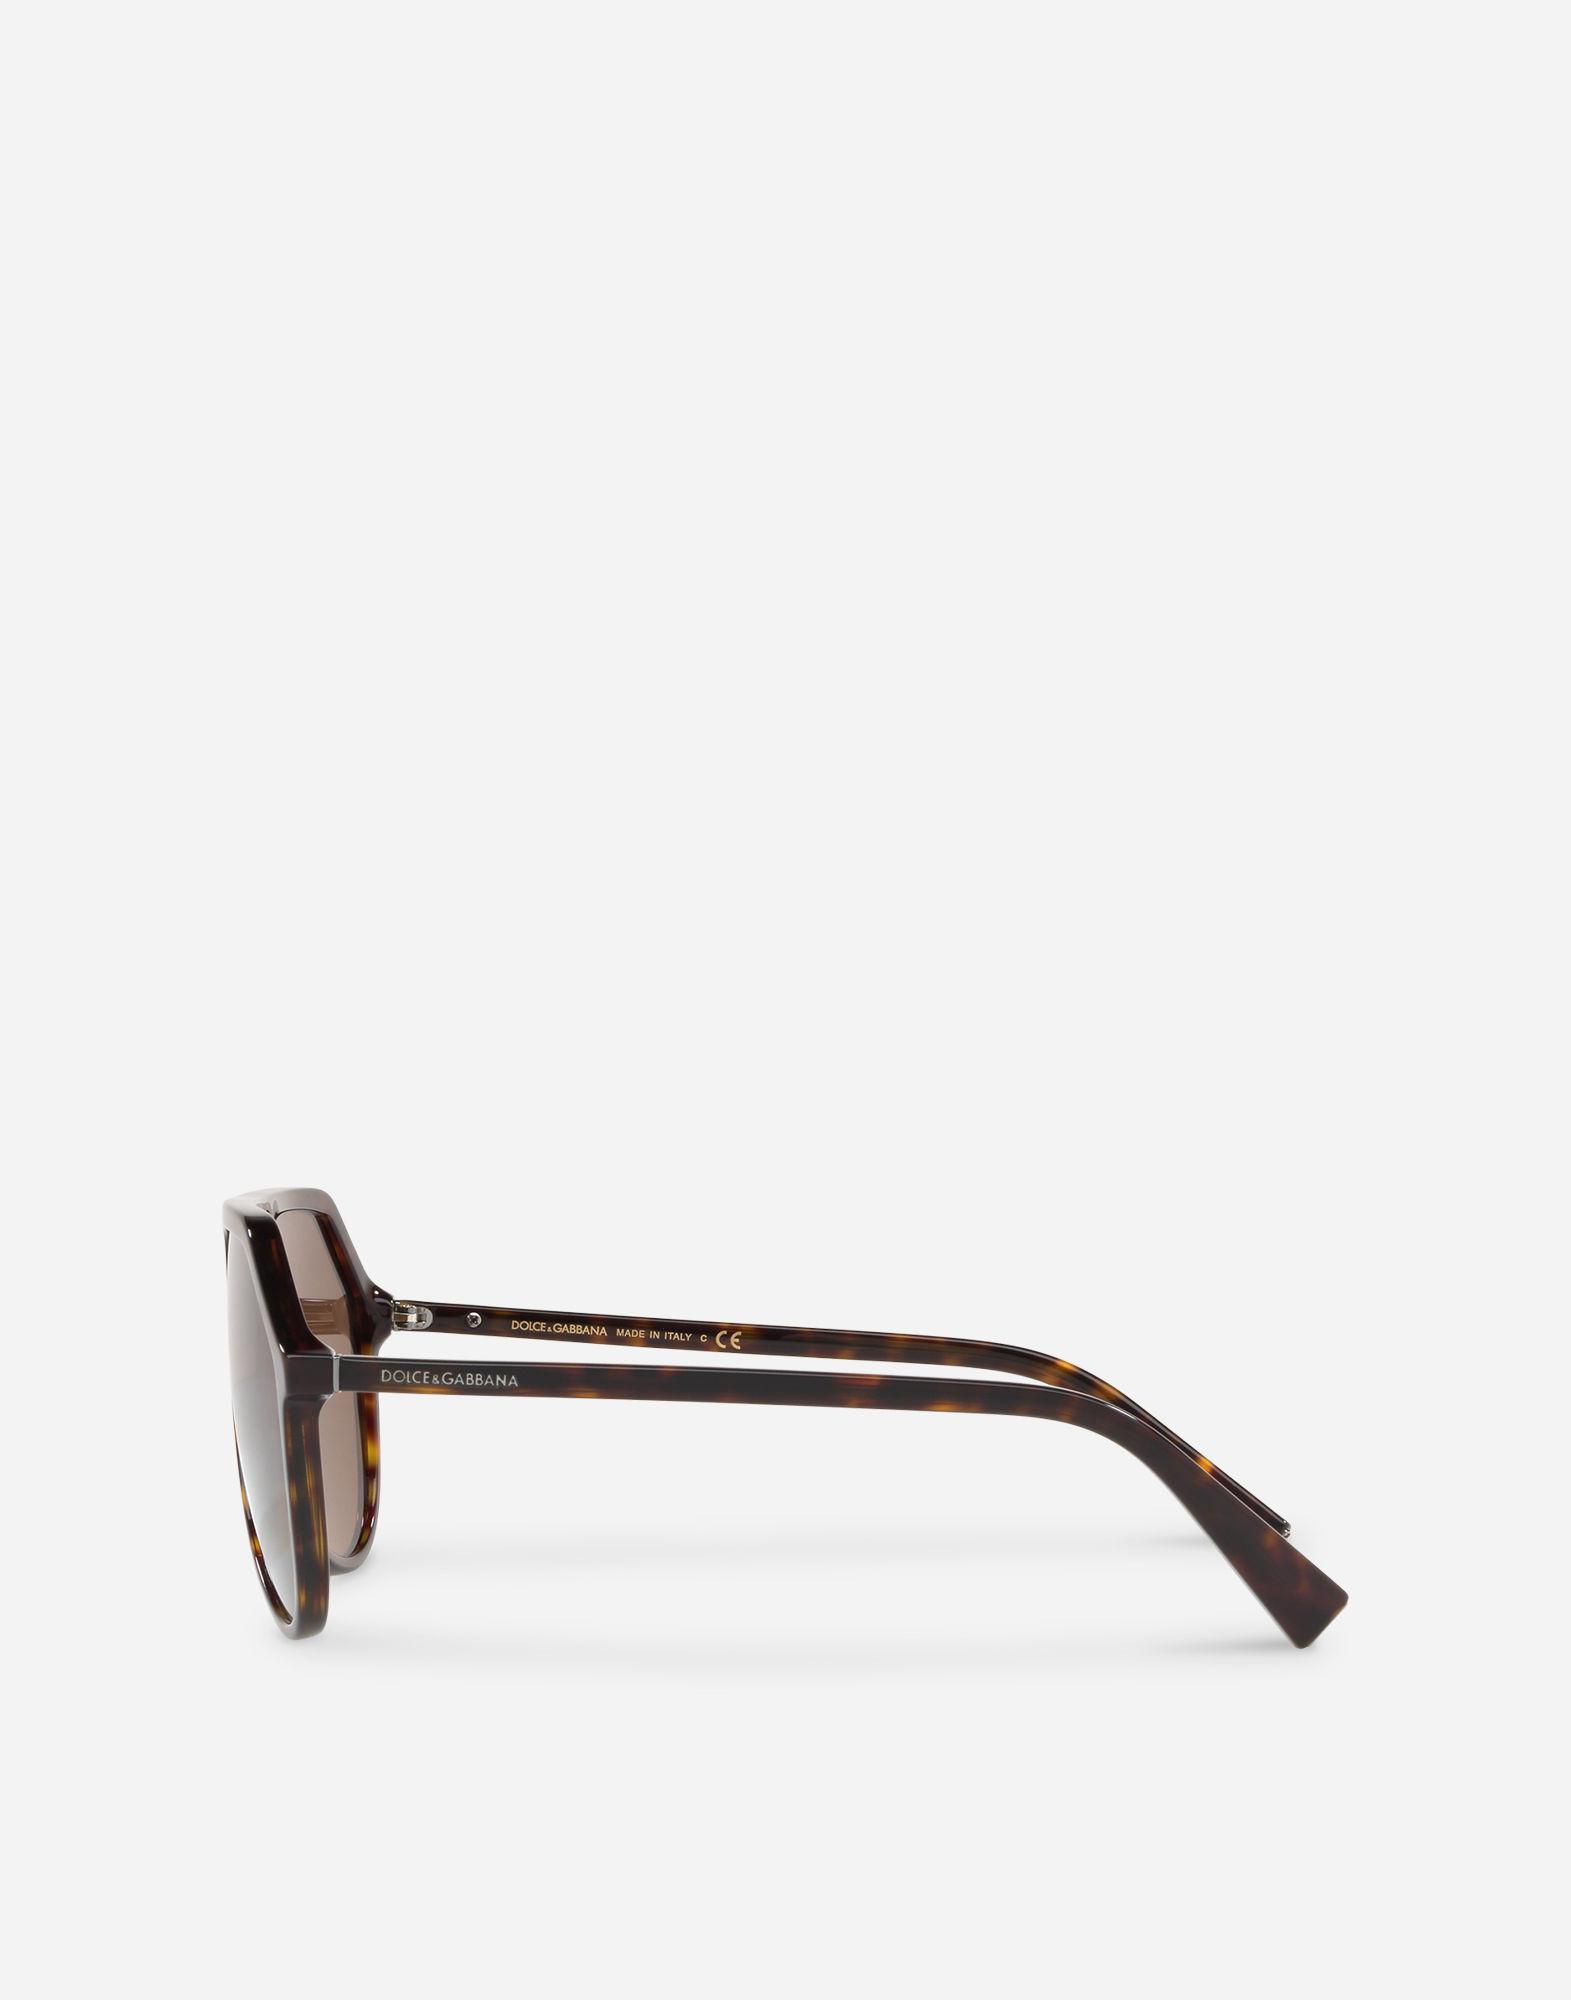 48295df0c36 Dolce   Gabbana Pilot Acetate Sunglasses With Keyhole Bridge in ...